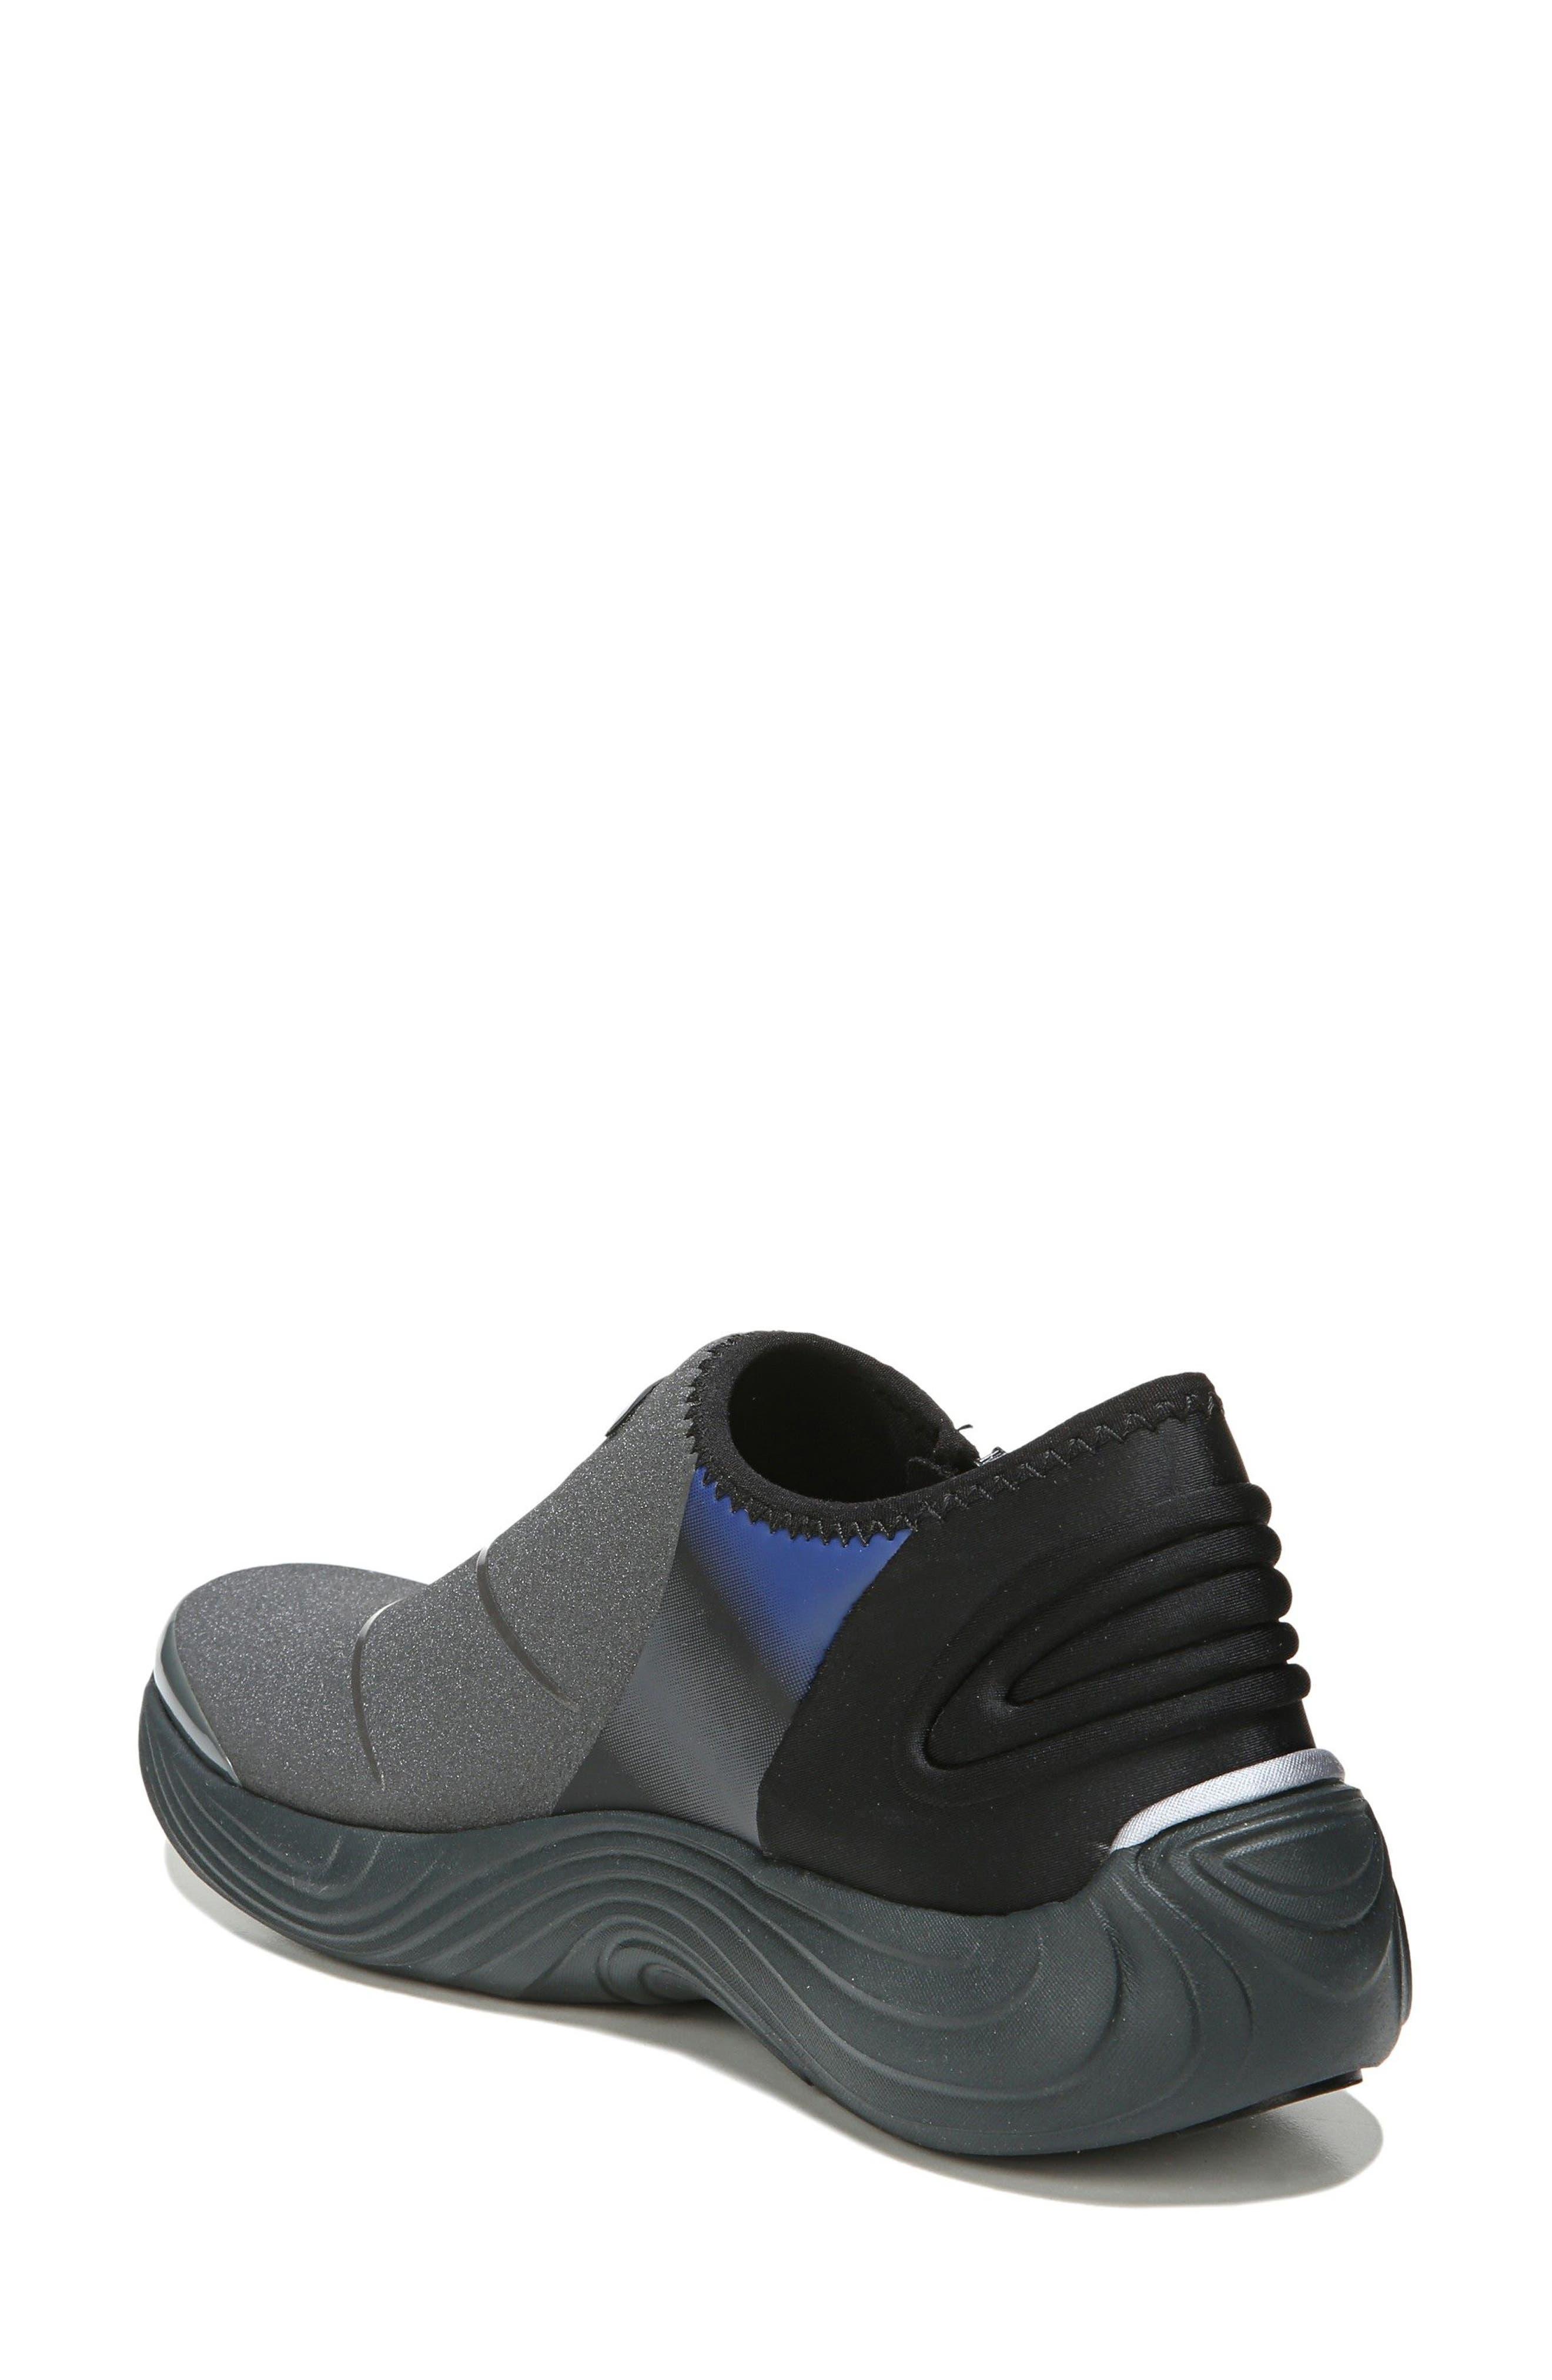 Trilogy Slip-On Sneaker,                             Alternate thumbnail 2, color,                             Grey Fabric